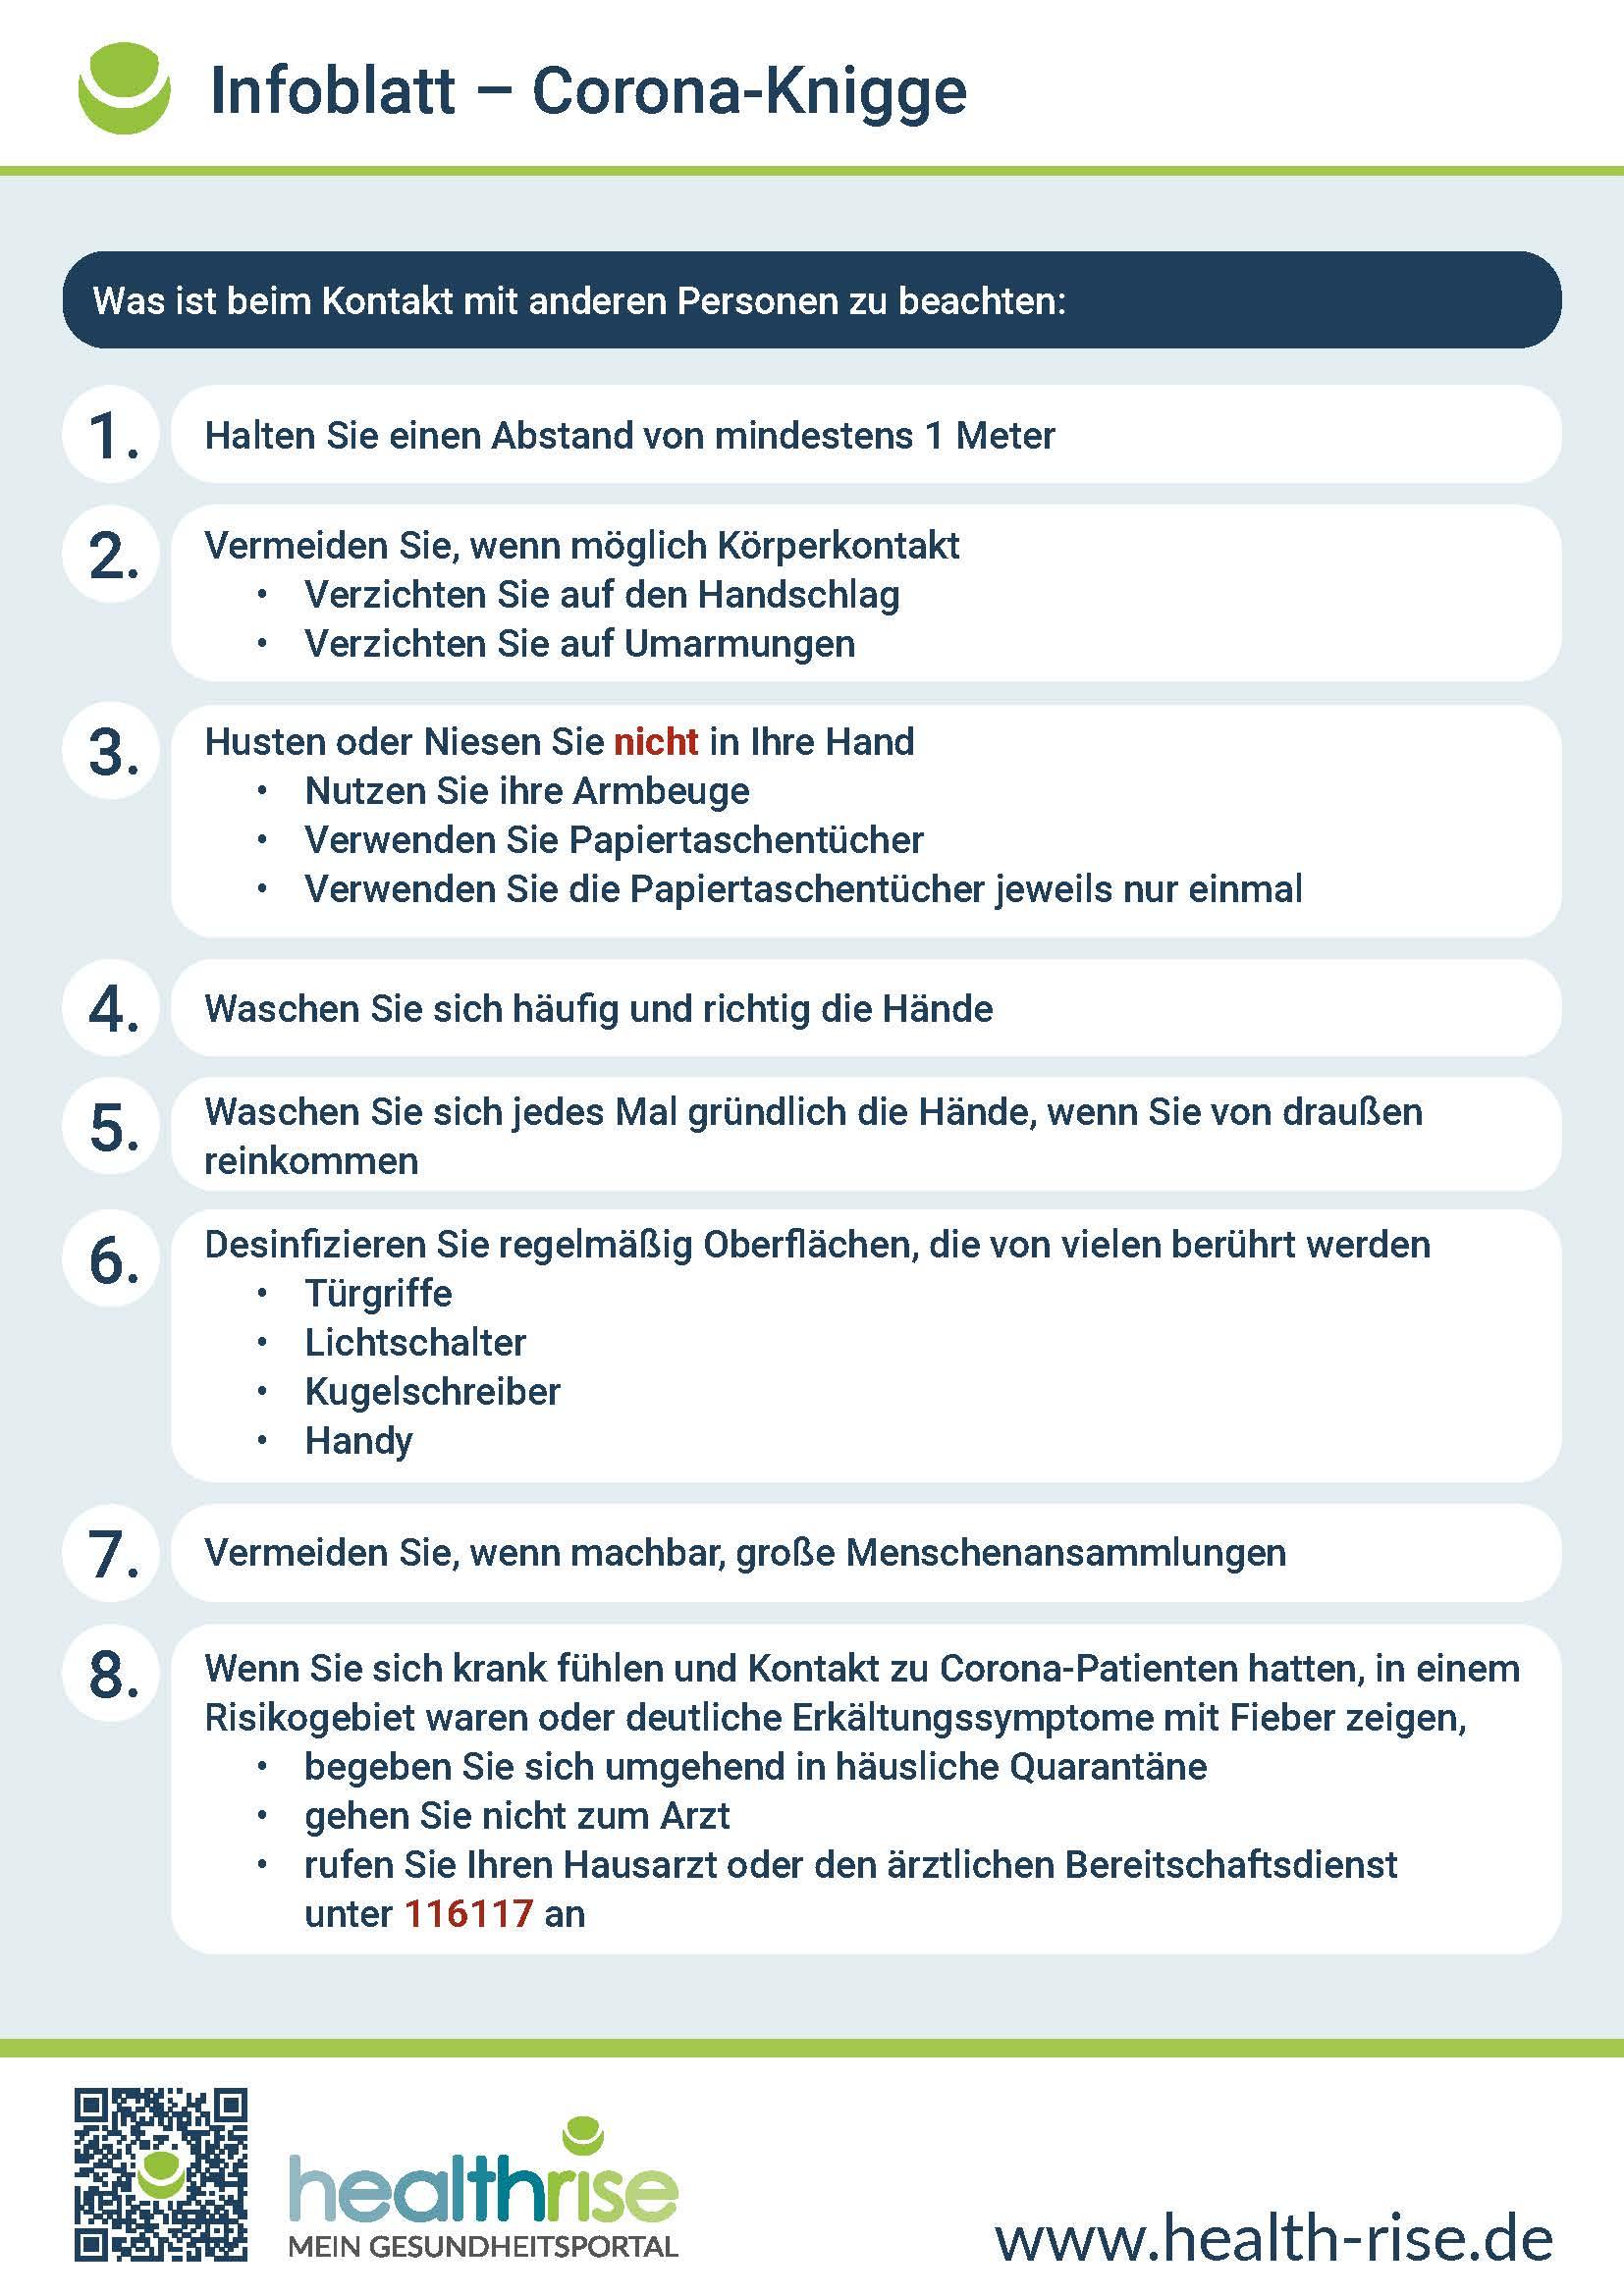 Corona-Knigge Infografik PDF